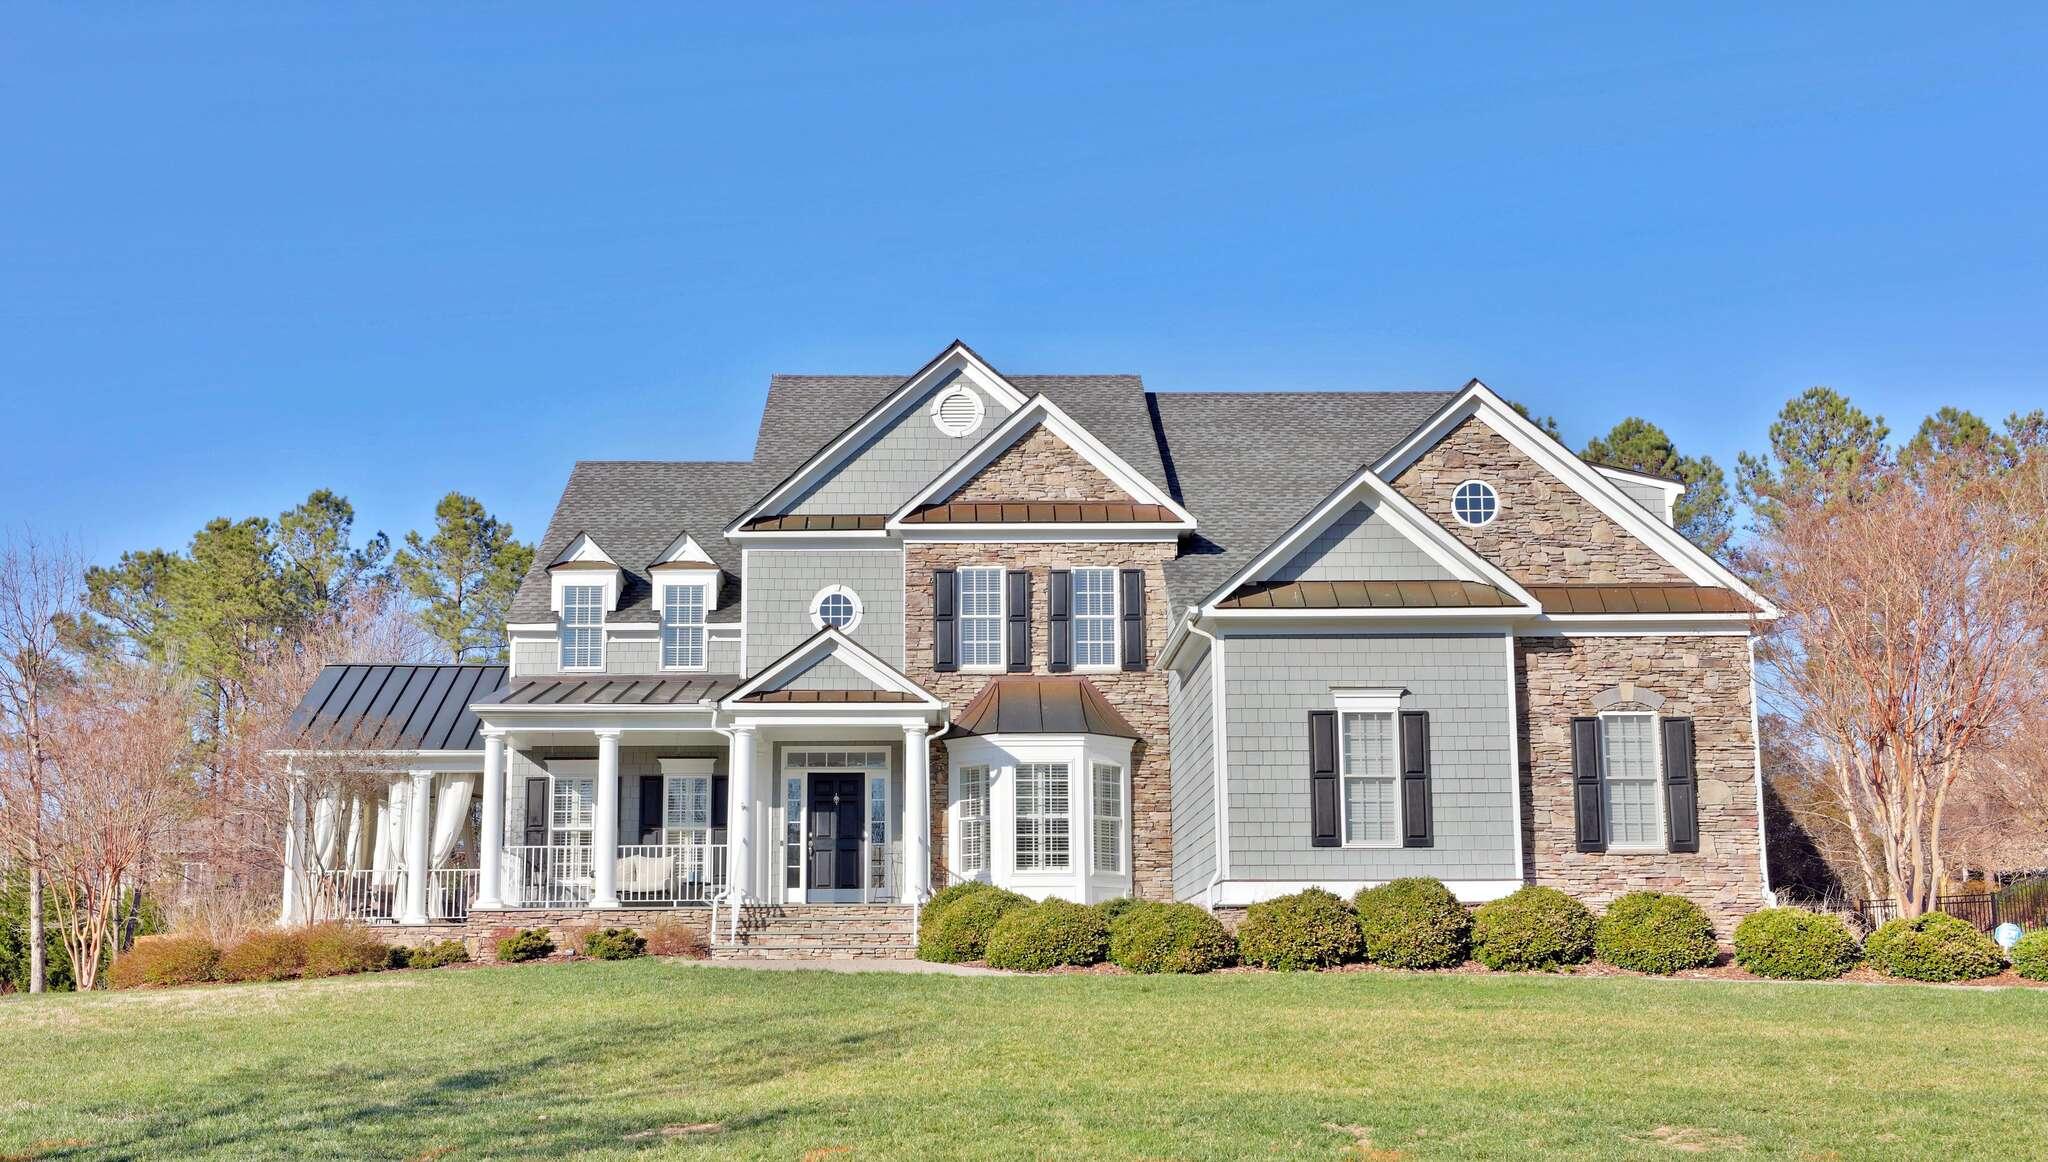 Single Family for Sale at 2218 Founders Bridge Road Midlothian, Virginia 23113 United States